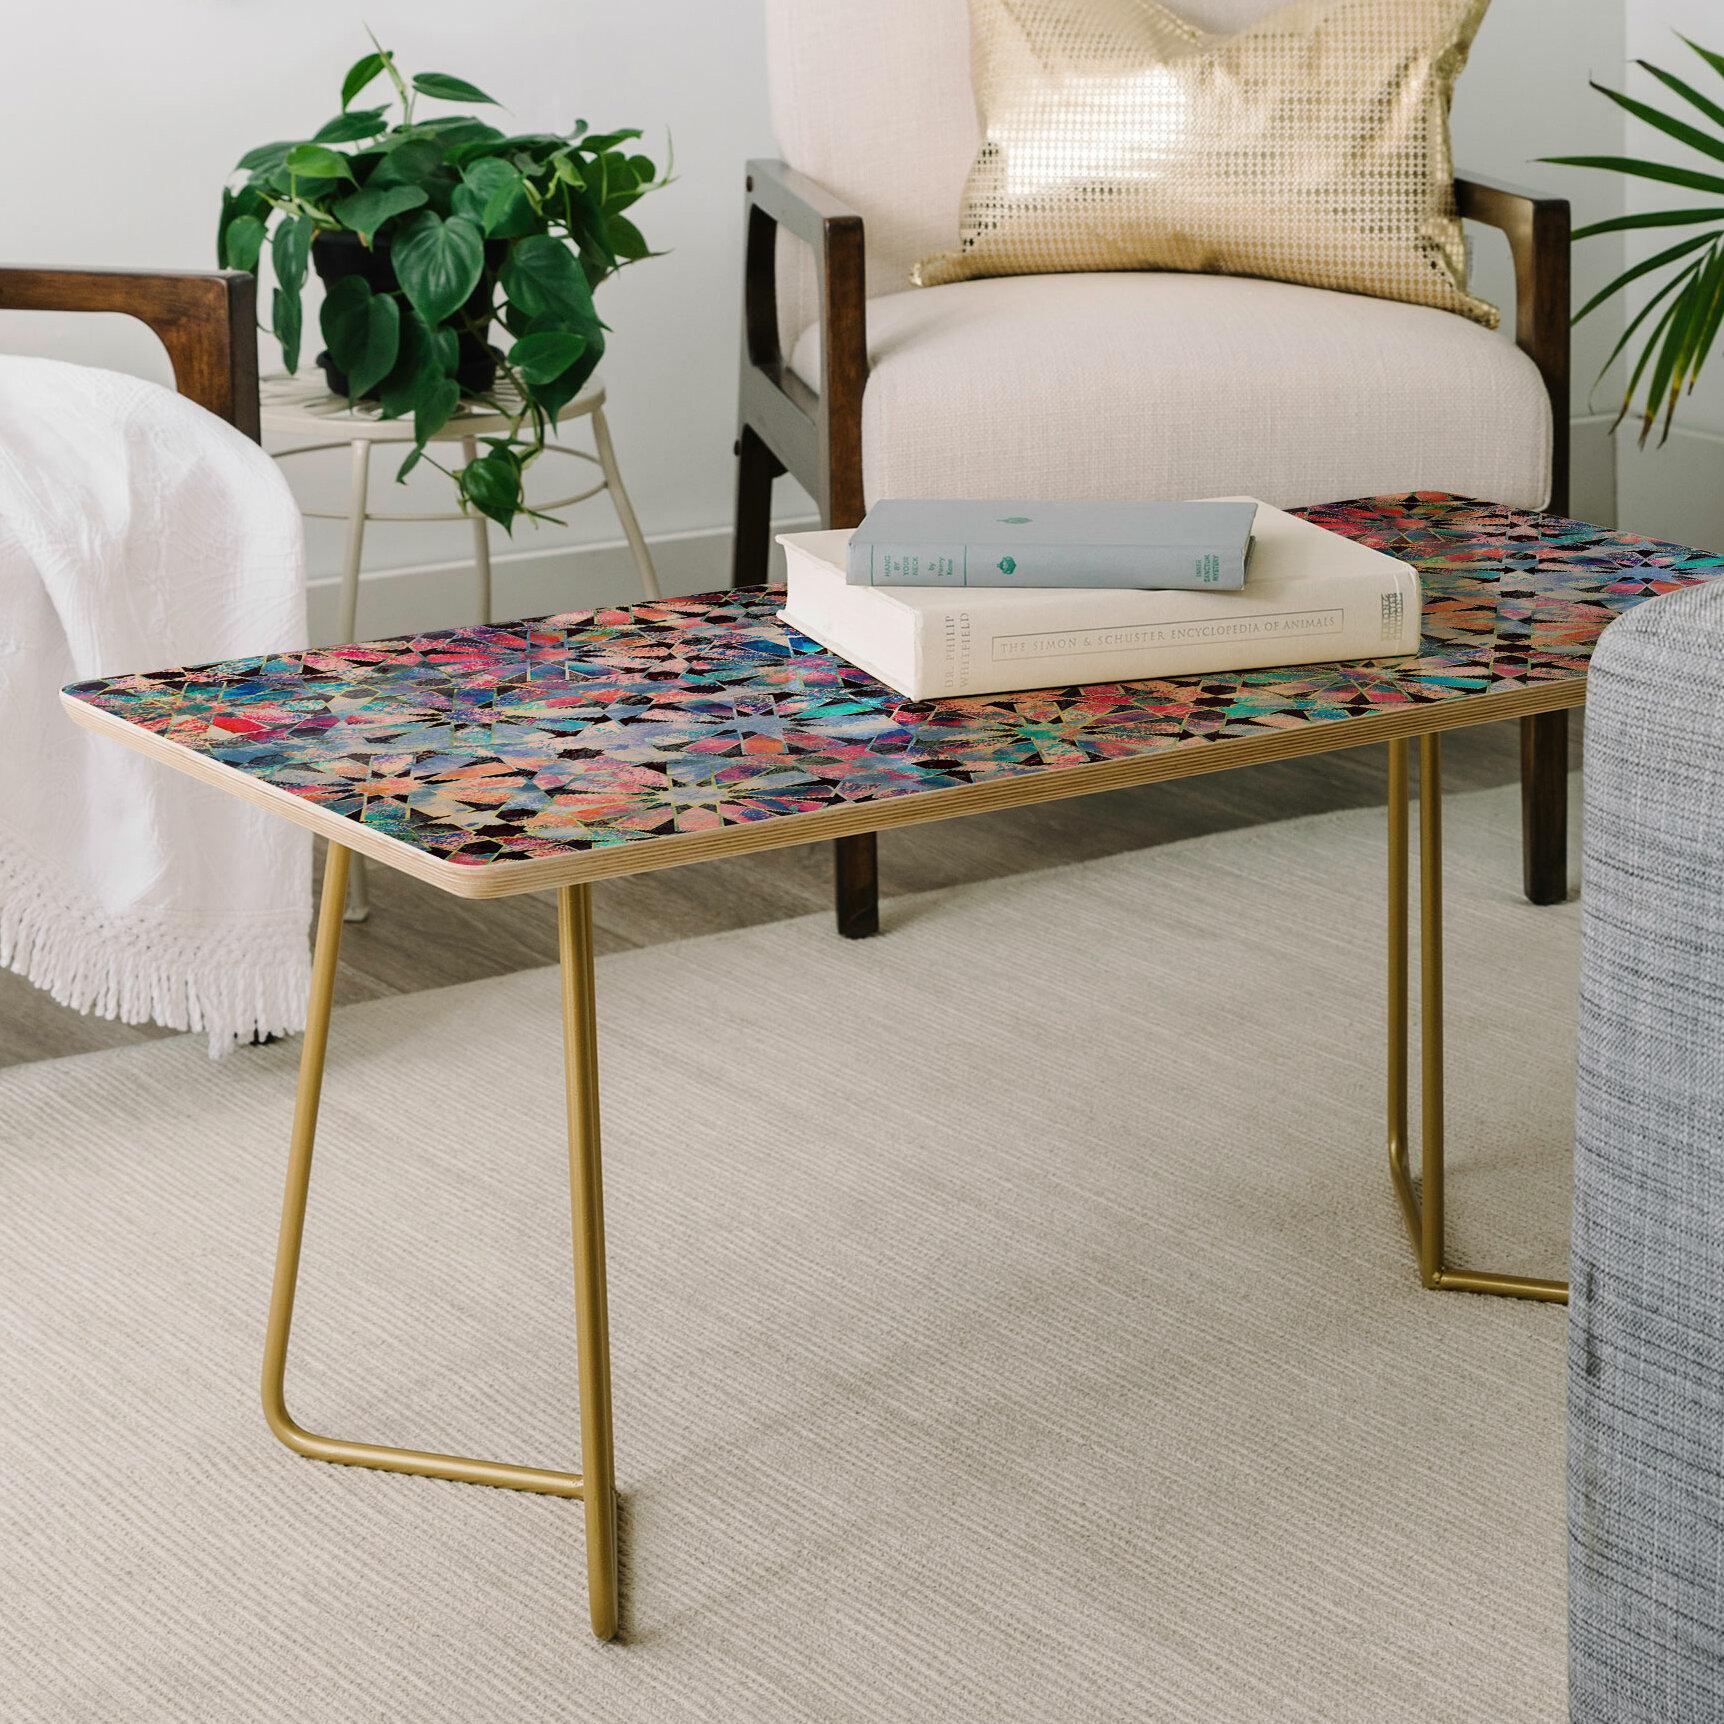 Schatz Dining Room: East Urban Home Schatzi Hara Tiles Coffee Table